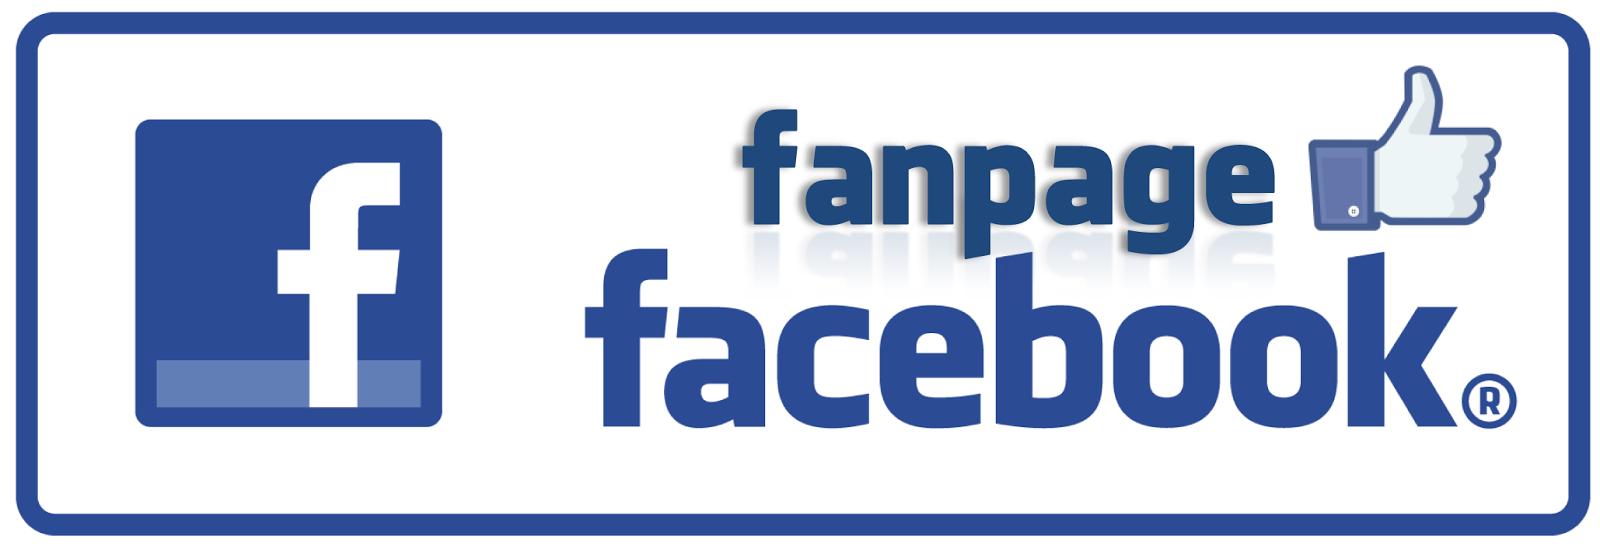 Cara Membuat fanpage Facebook - Dikumpulbagi